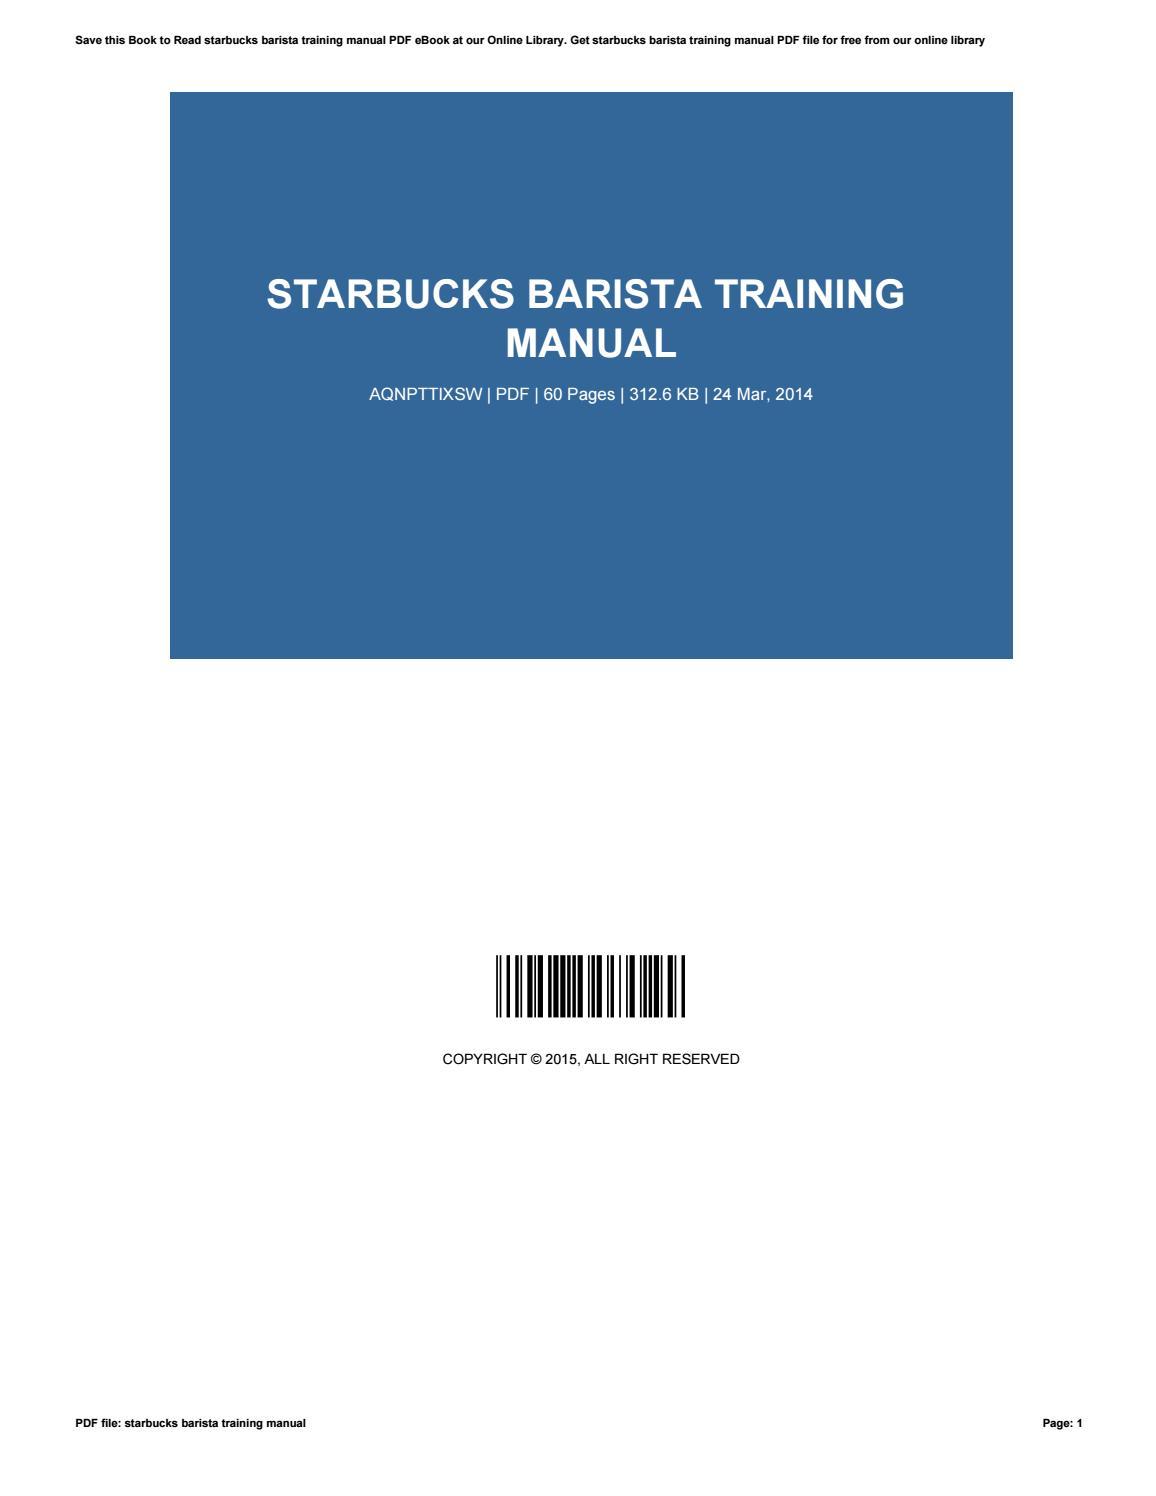 Starbucks barista training manual by JamesBrown18651 - Issuu